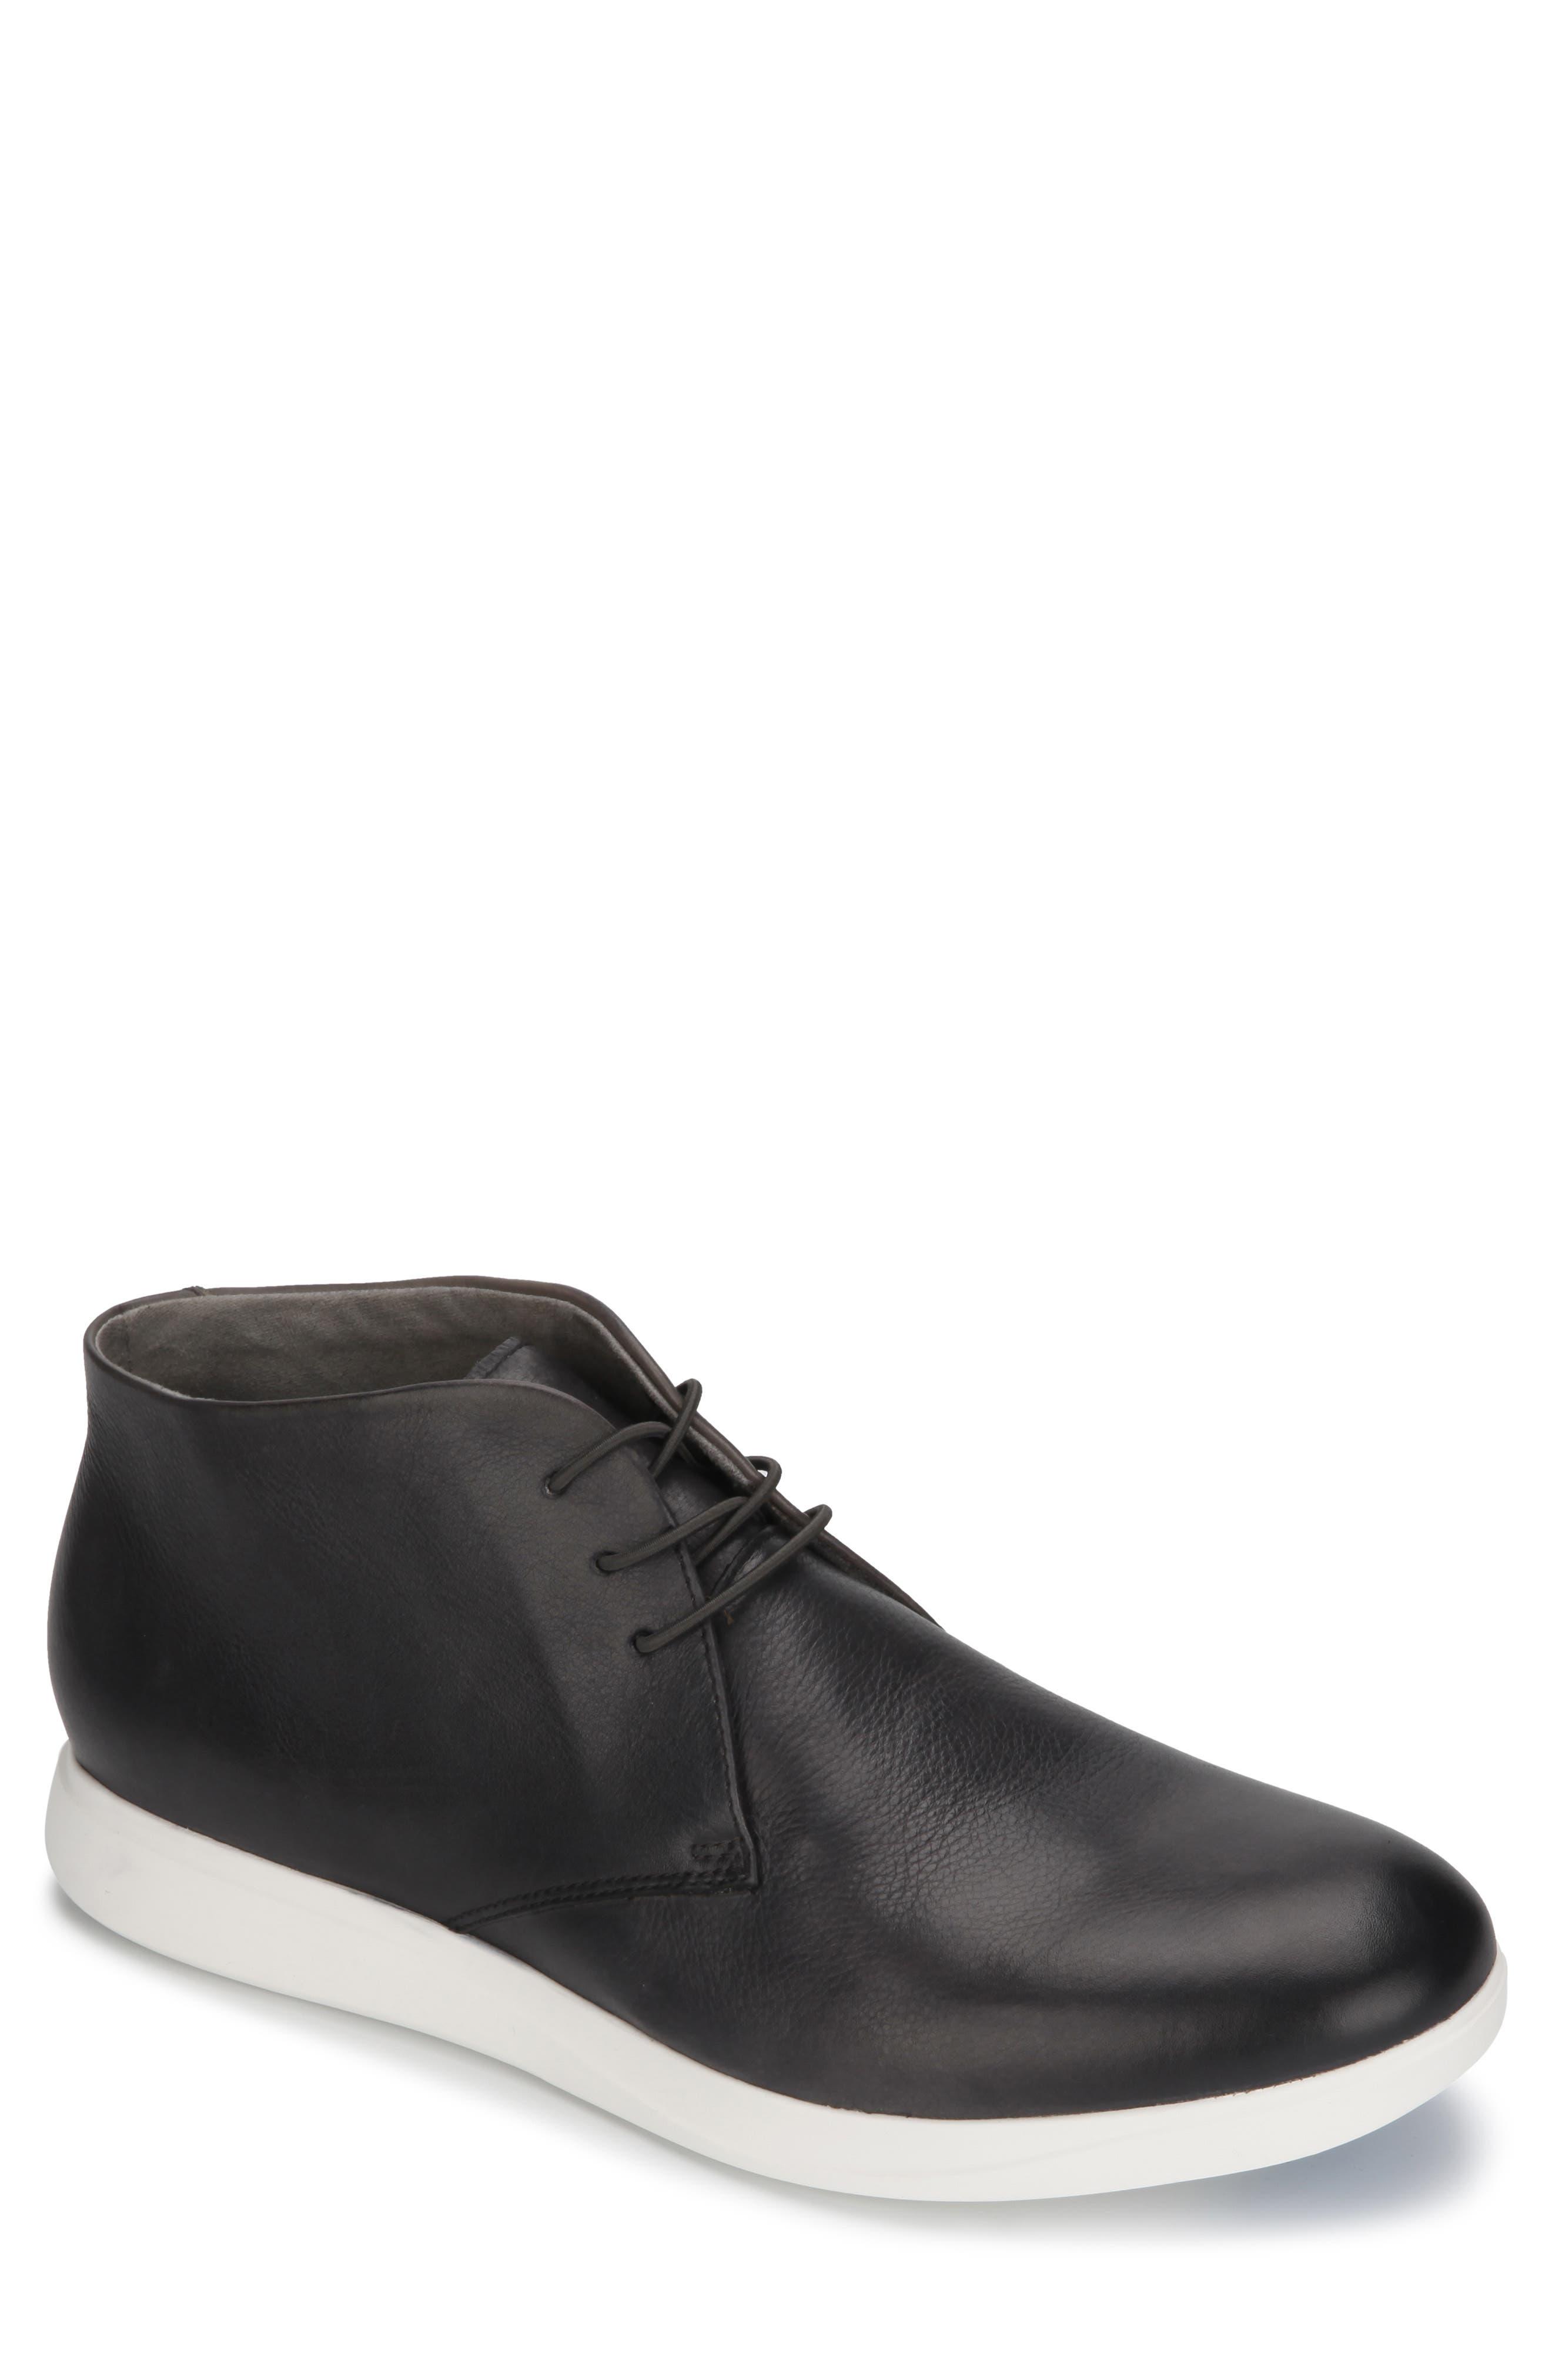 KENNETH COLE NEW YORK Rocketpod Chukka Sneaker, Main, color, GREY TUMBLED LEATHER